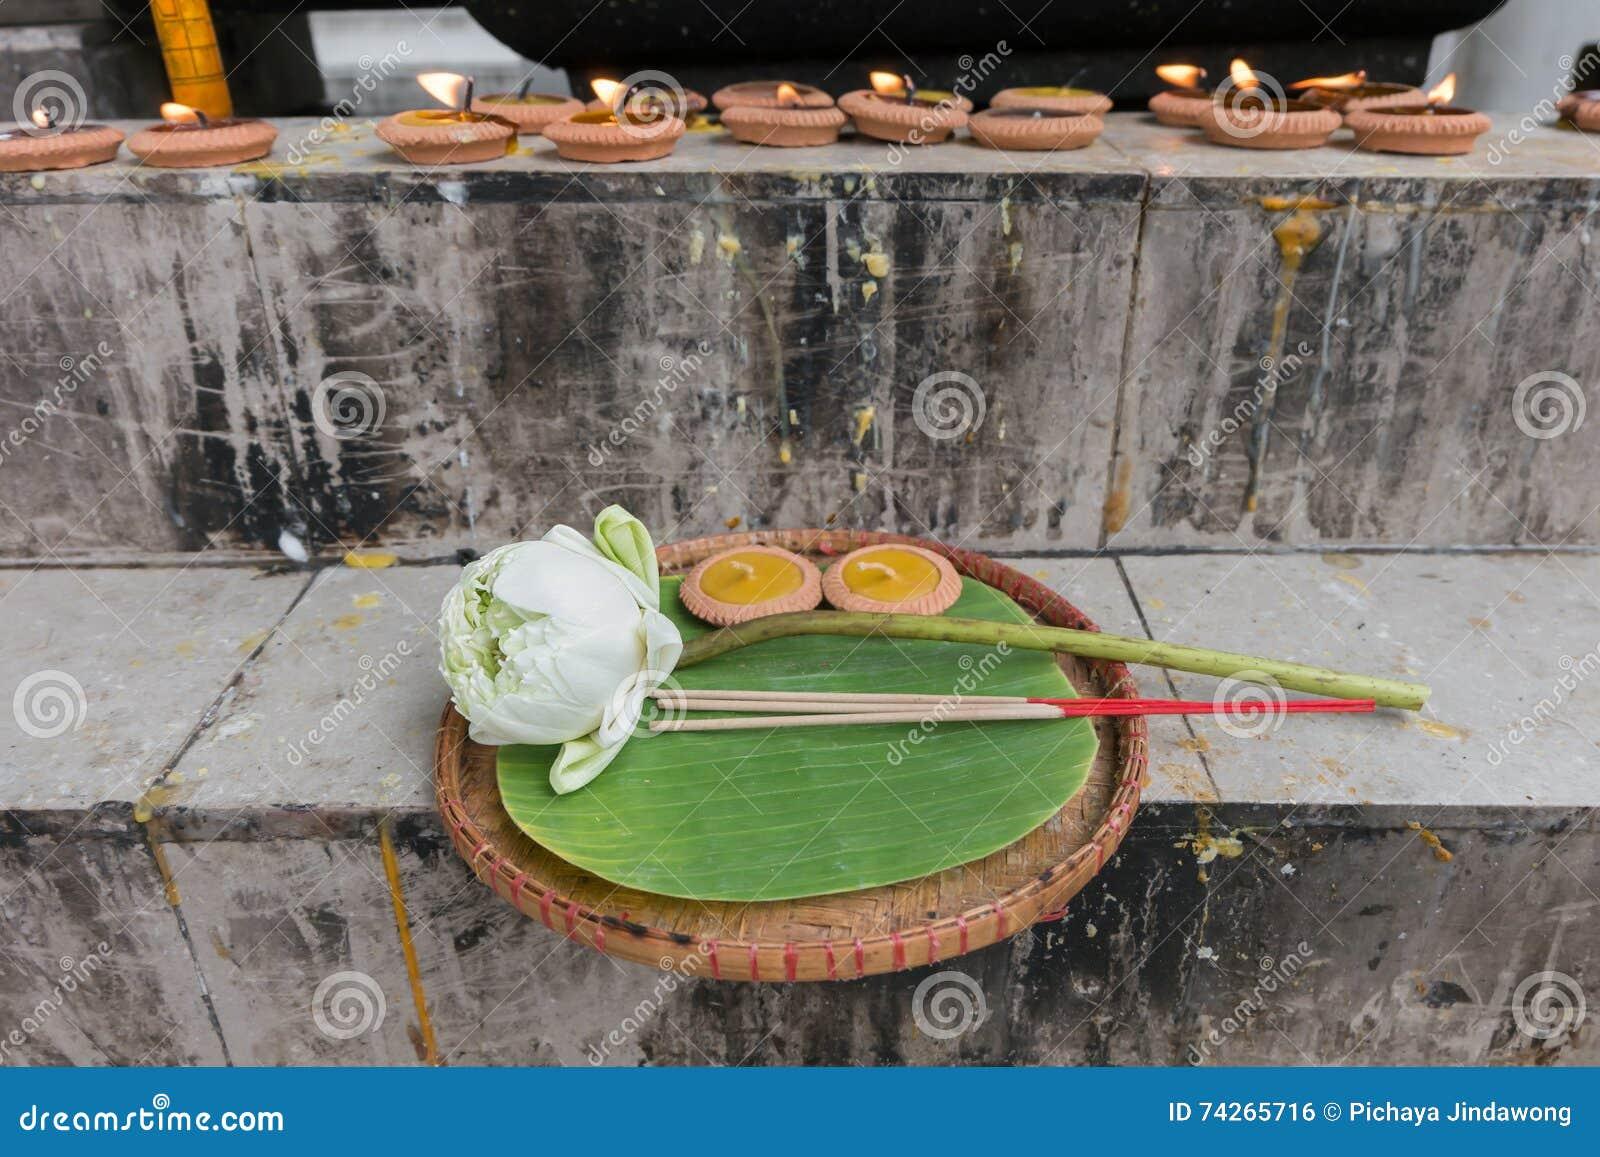 Lotus, Incense Sticks And Candles Set For Praying Buddha Stock Photo